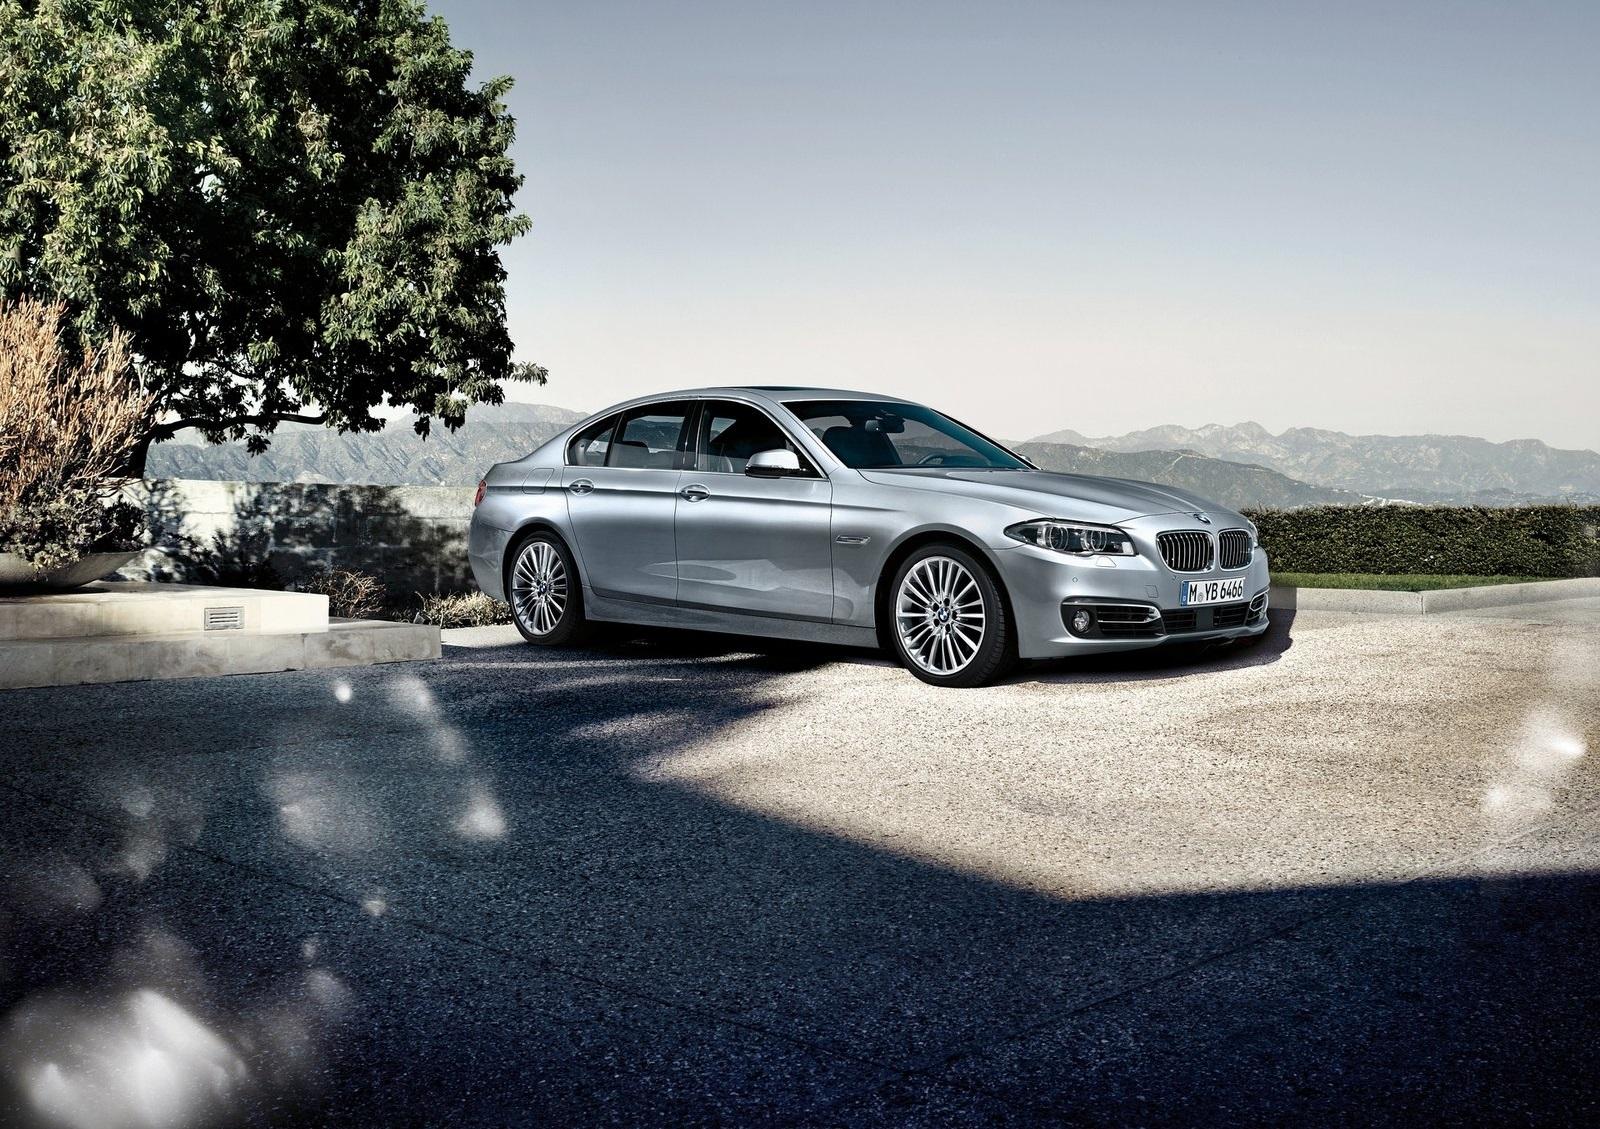 BMW 5 Series 2014 1600 01